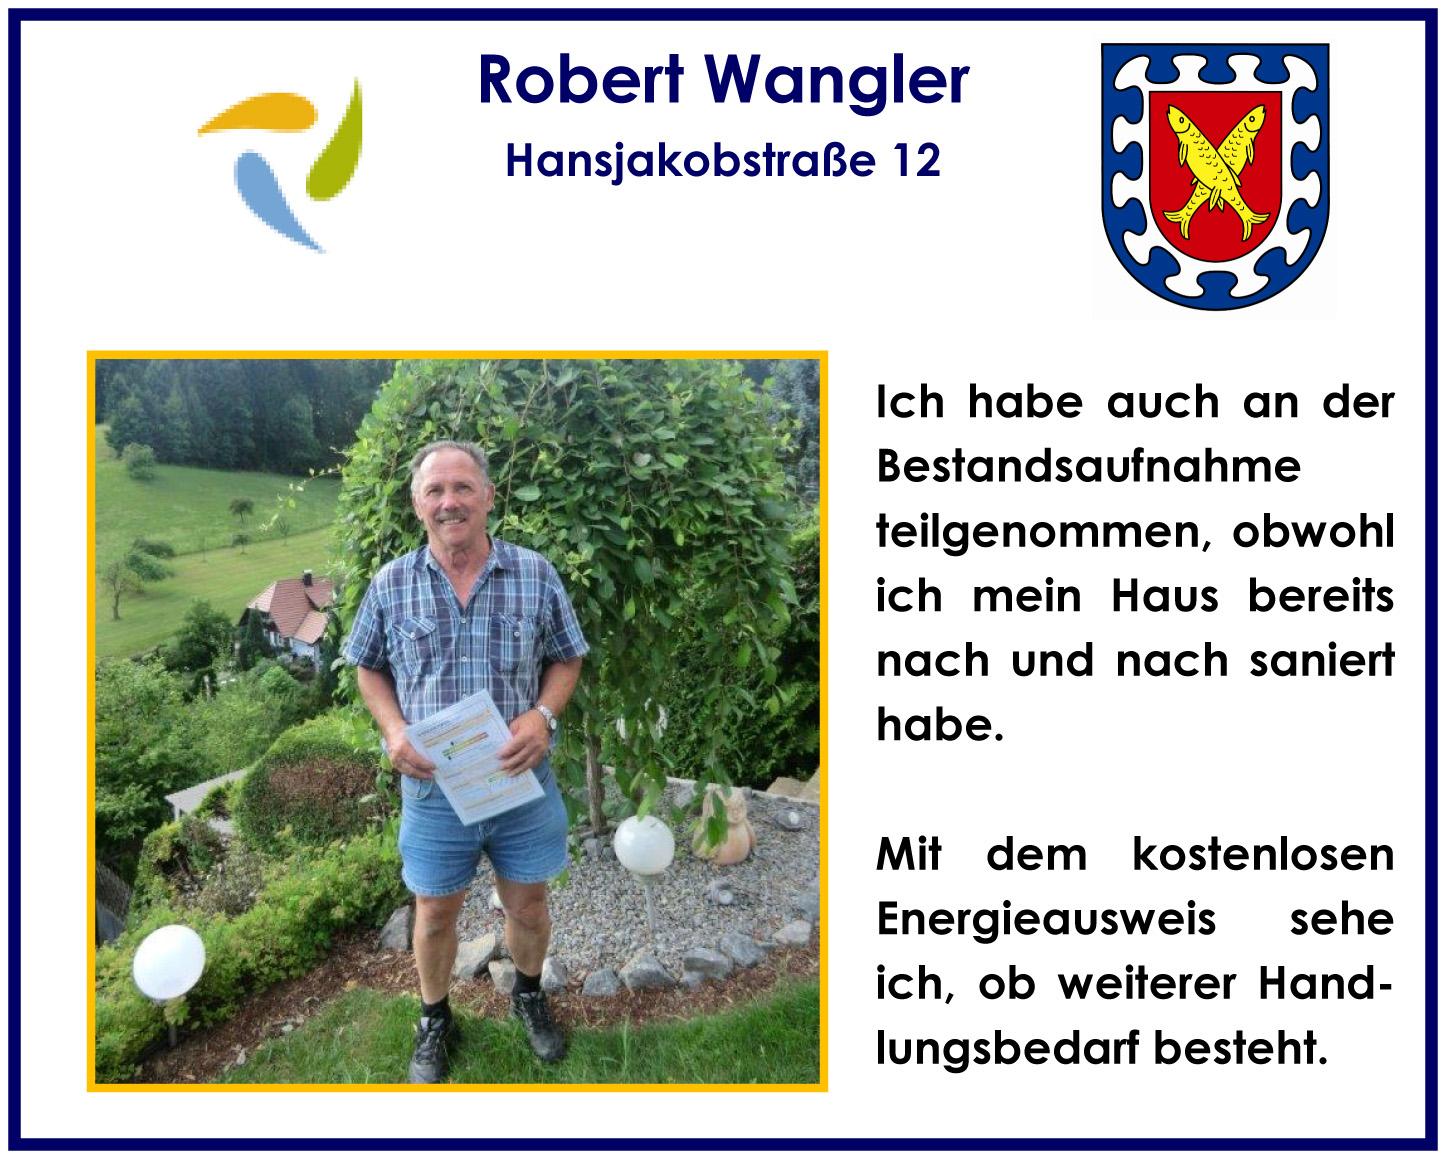 Robert_Wangler_-_Werbung_Bestandsaufnahme